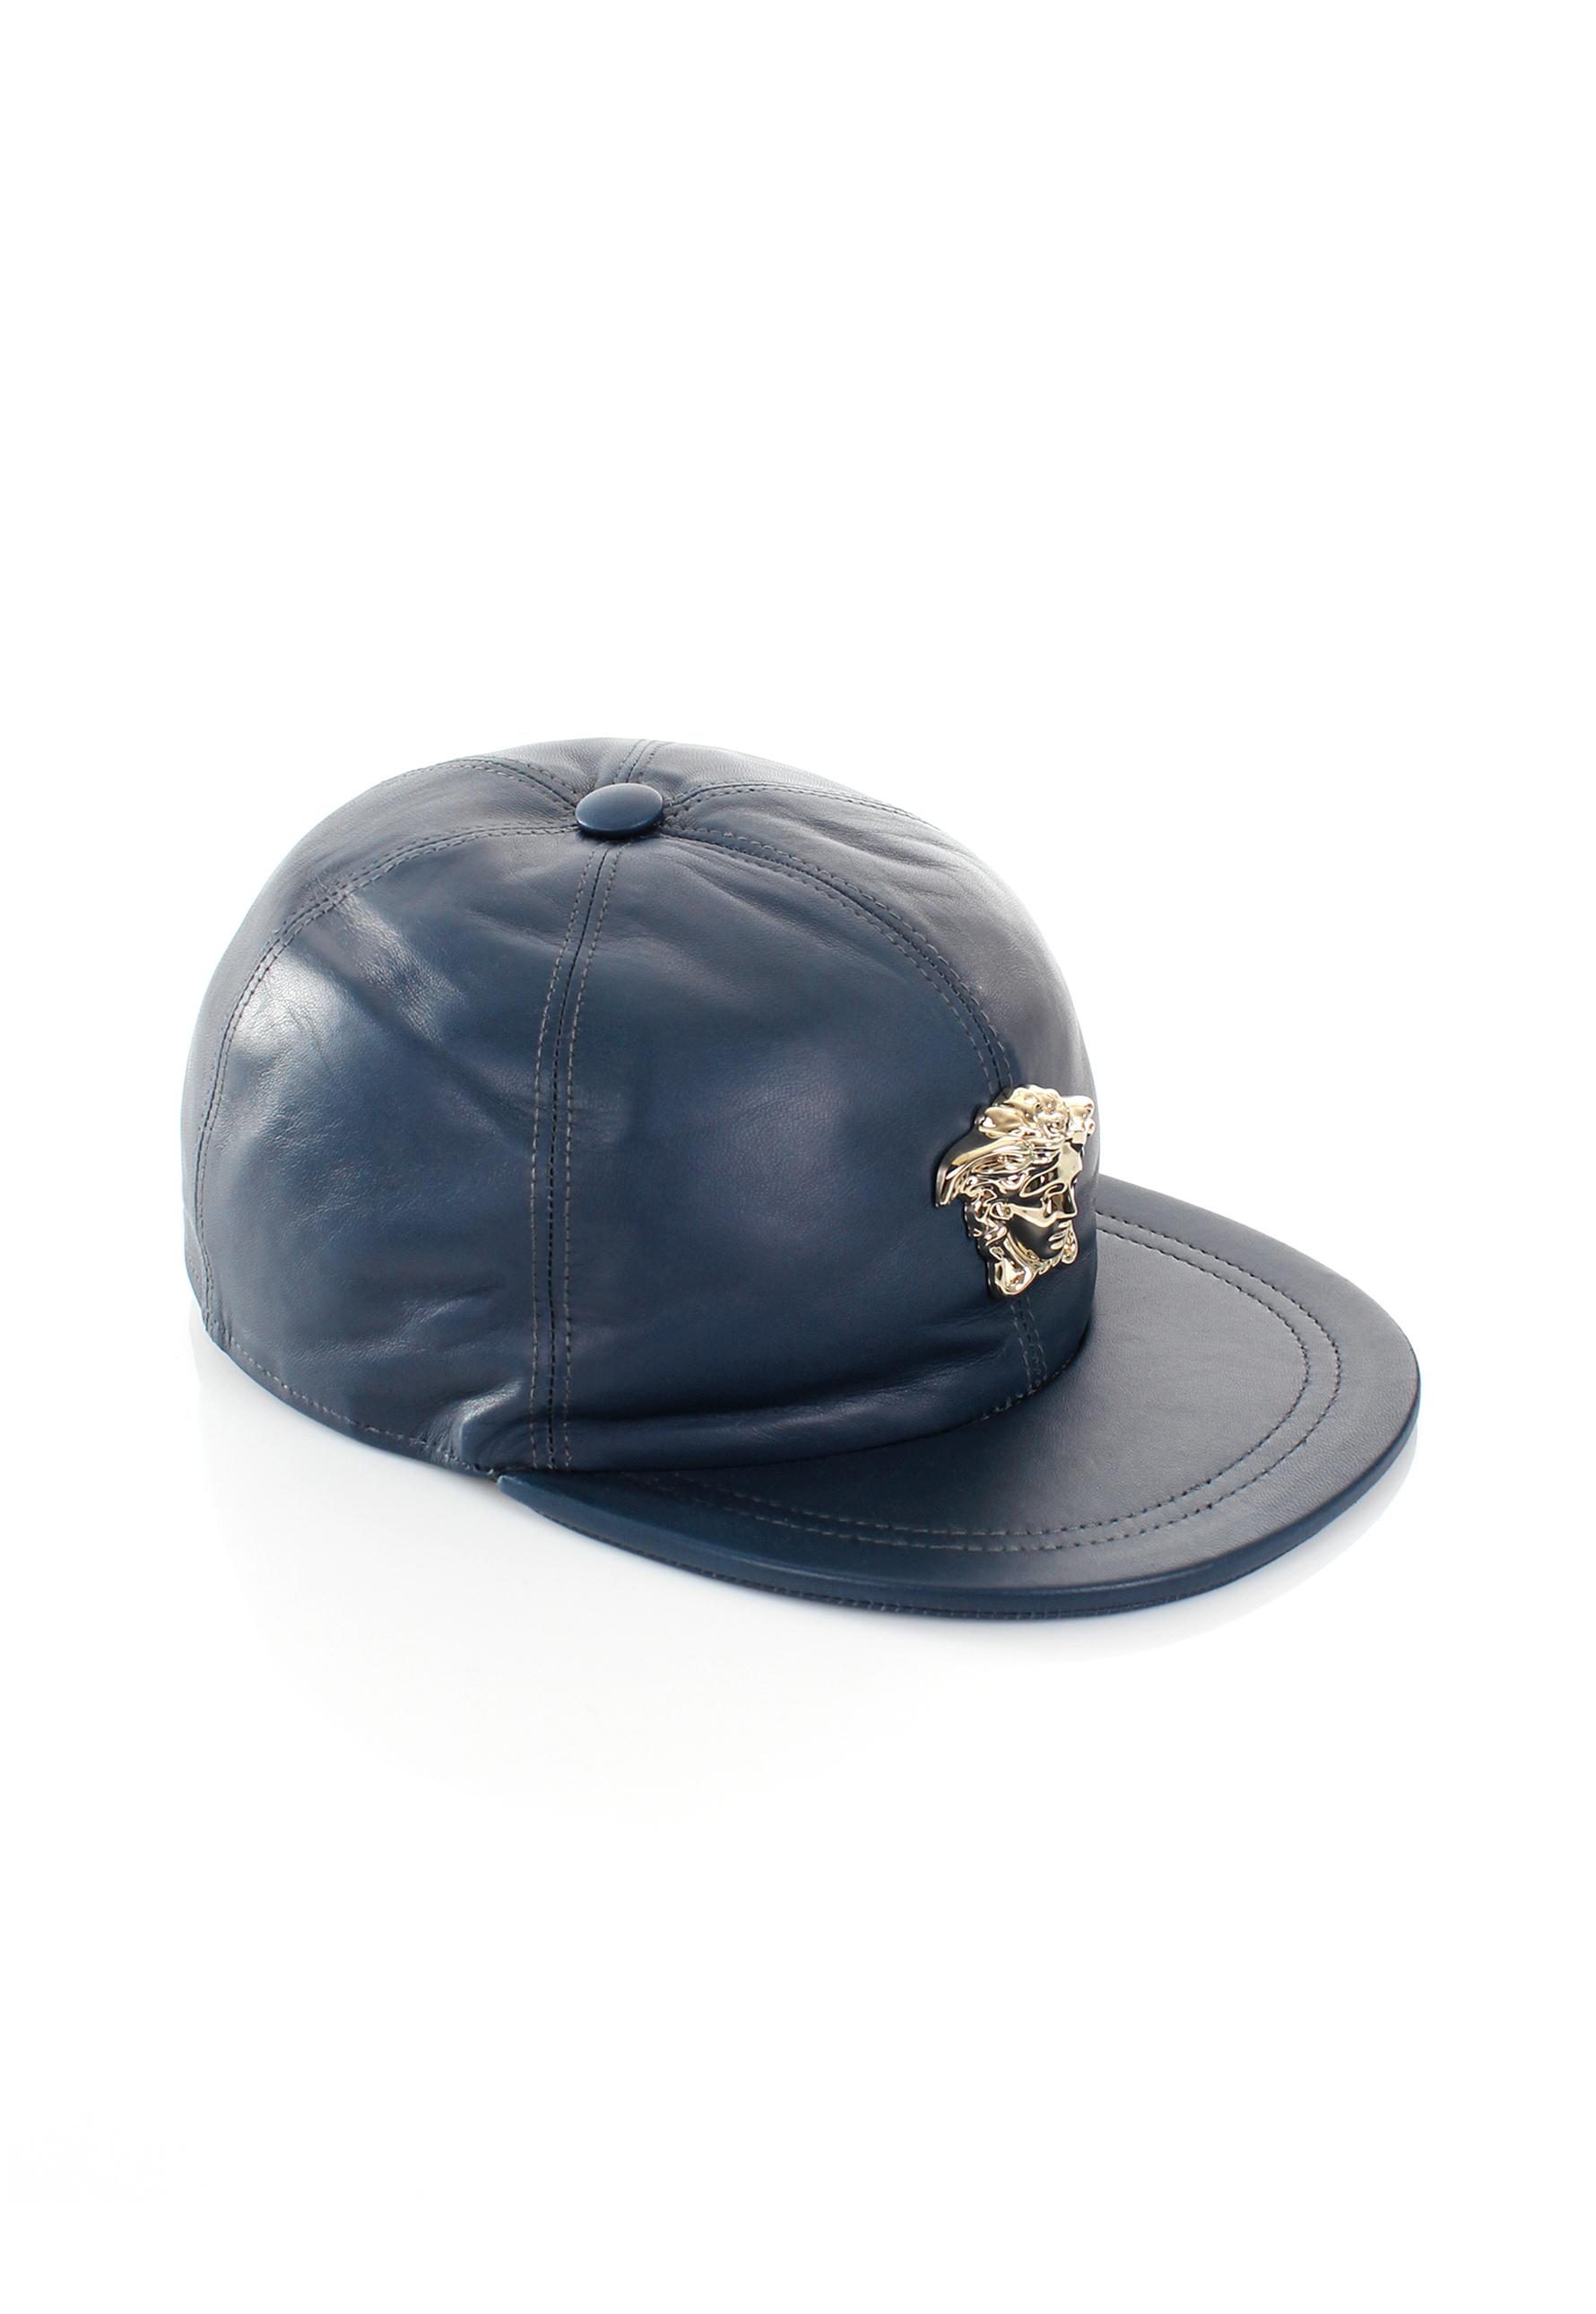 Lyst - Versace Gold Medusa Leather Cap Blue in Blue for Men 8ff825e3db21